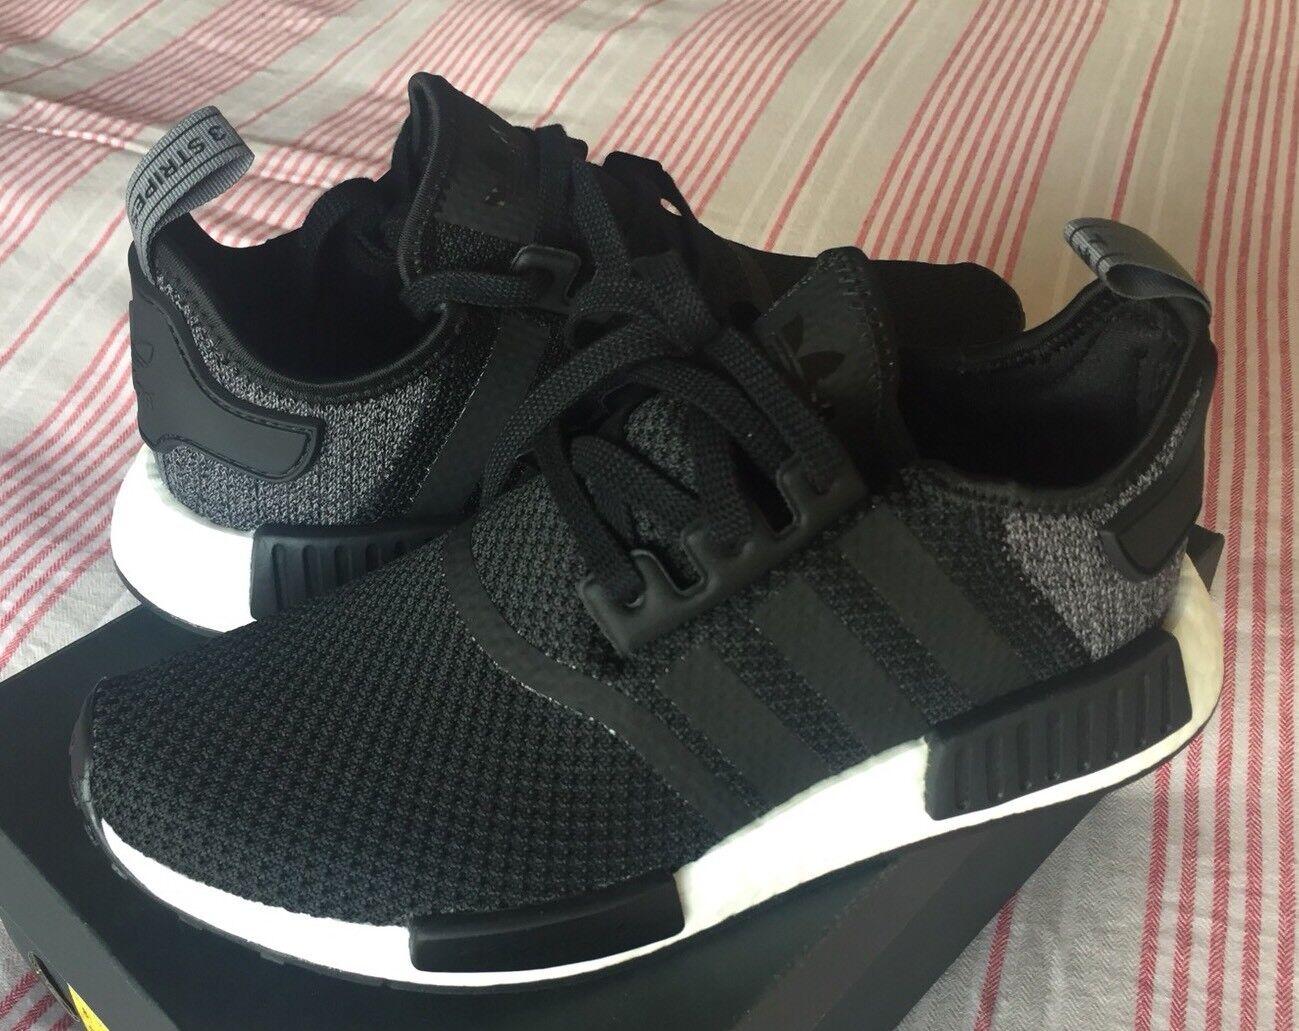 Adidas NMD_R1 Us8,5 42 Originals NEW Nmd Db0544